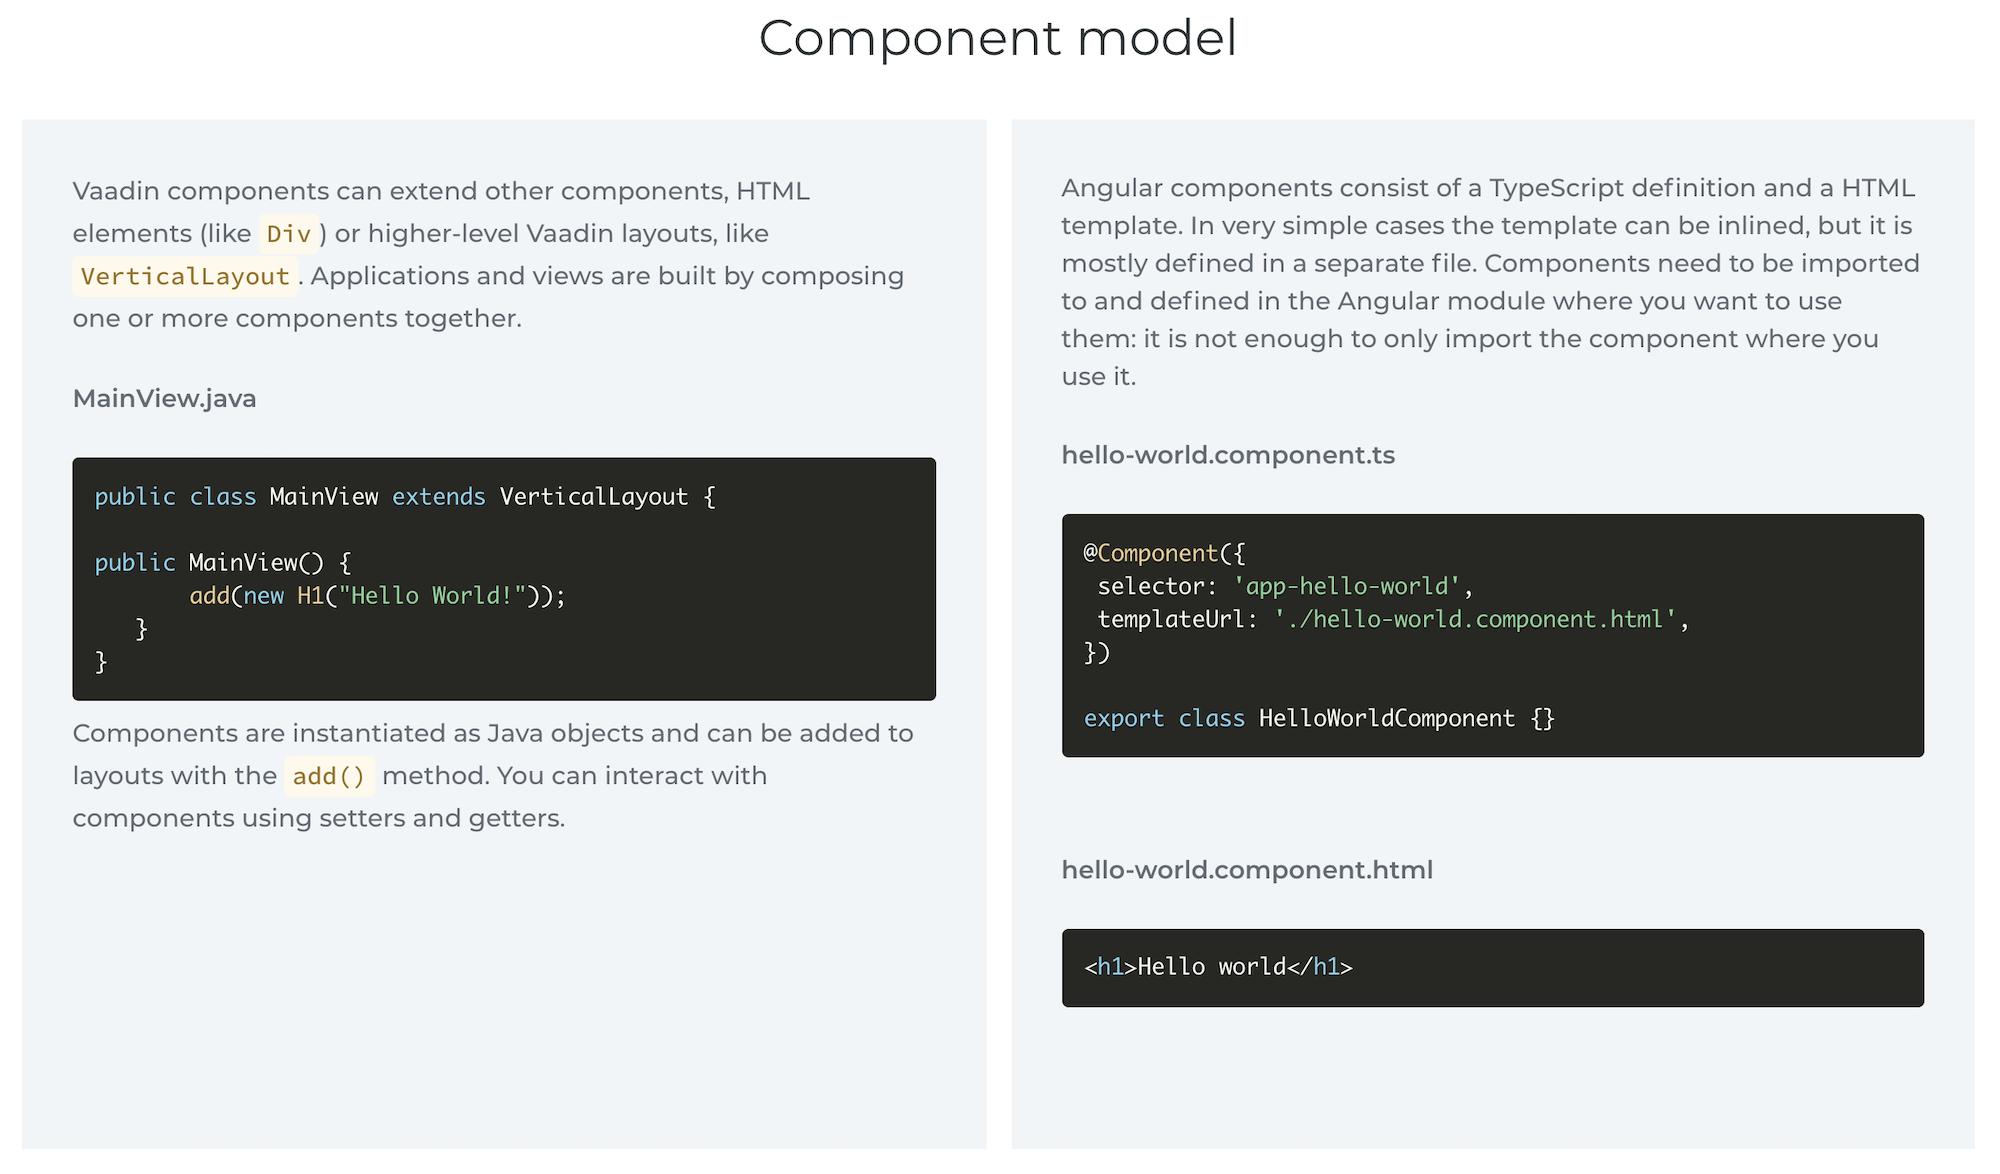 Comparing Vaadin and Angular component models